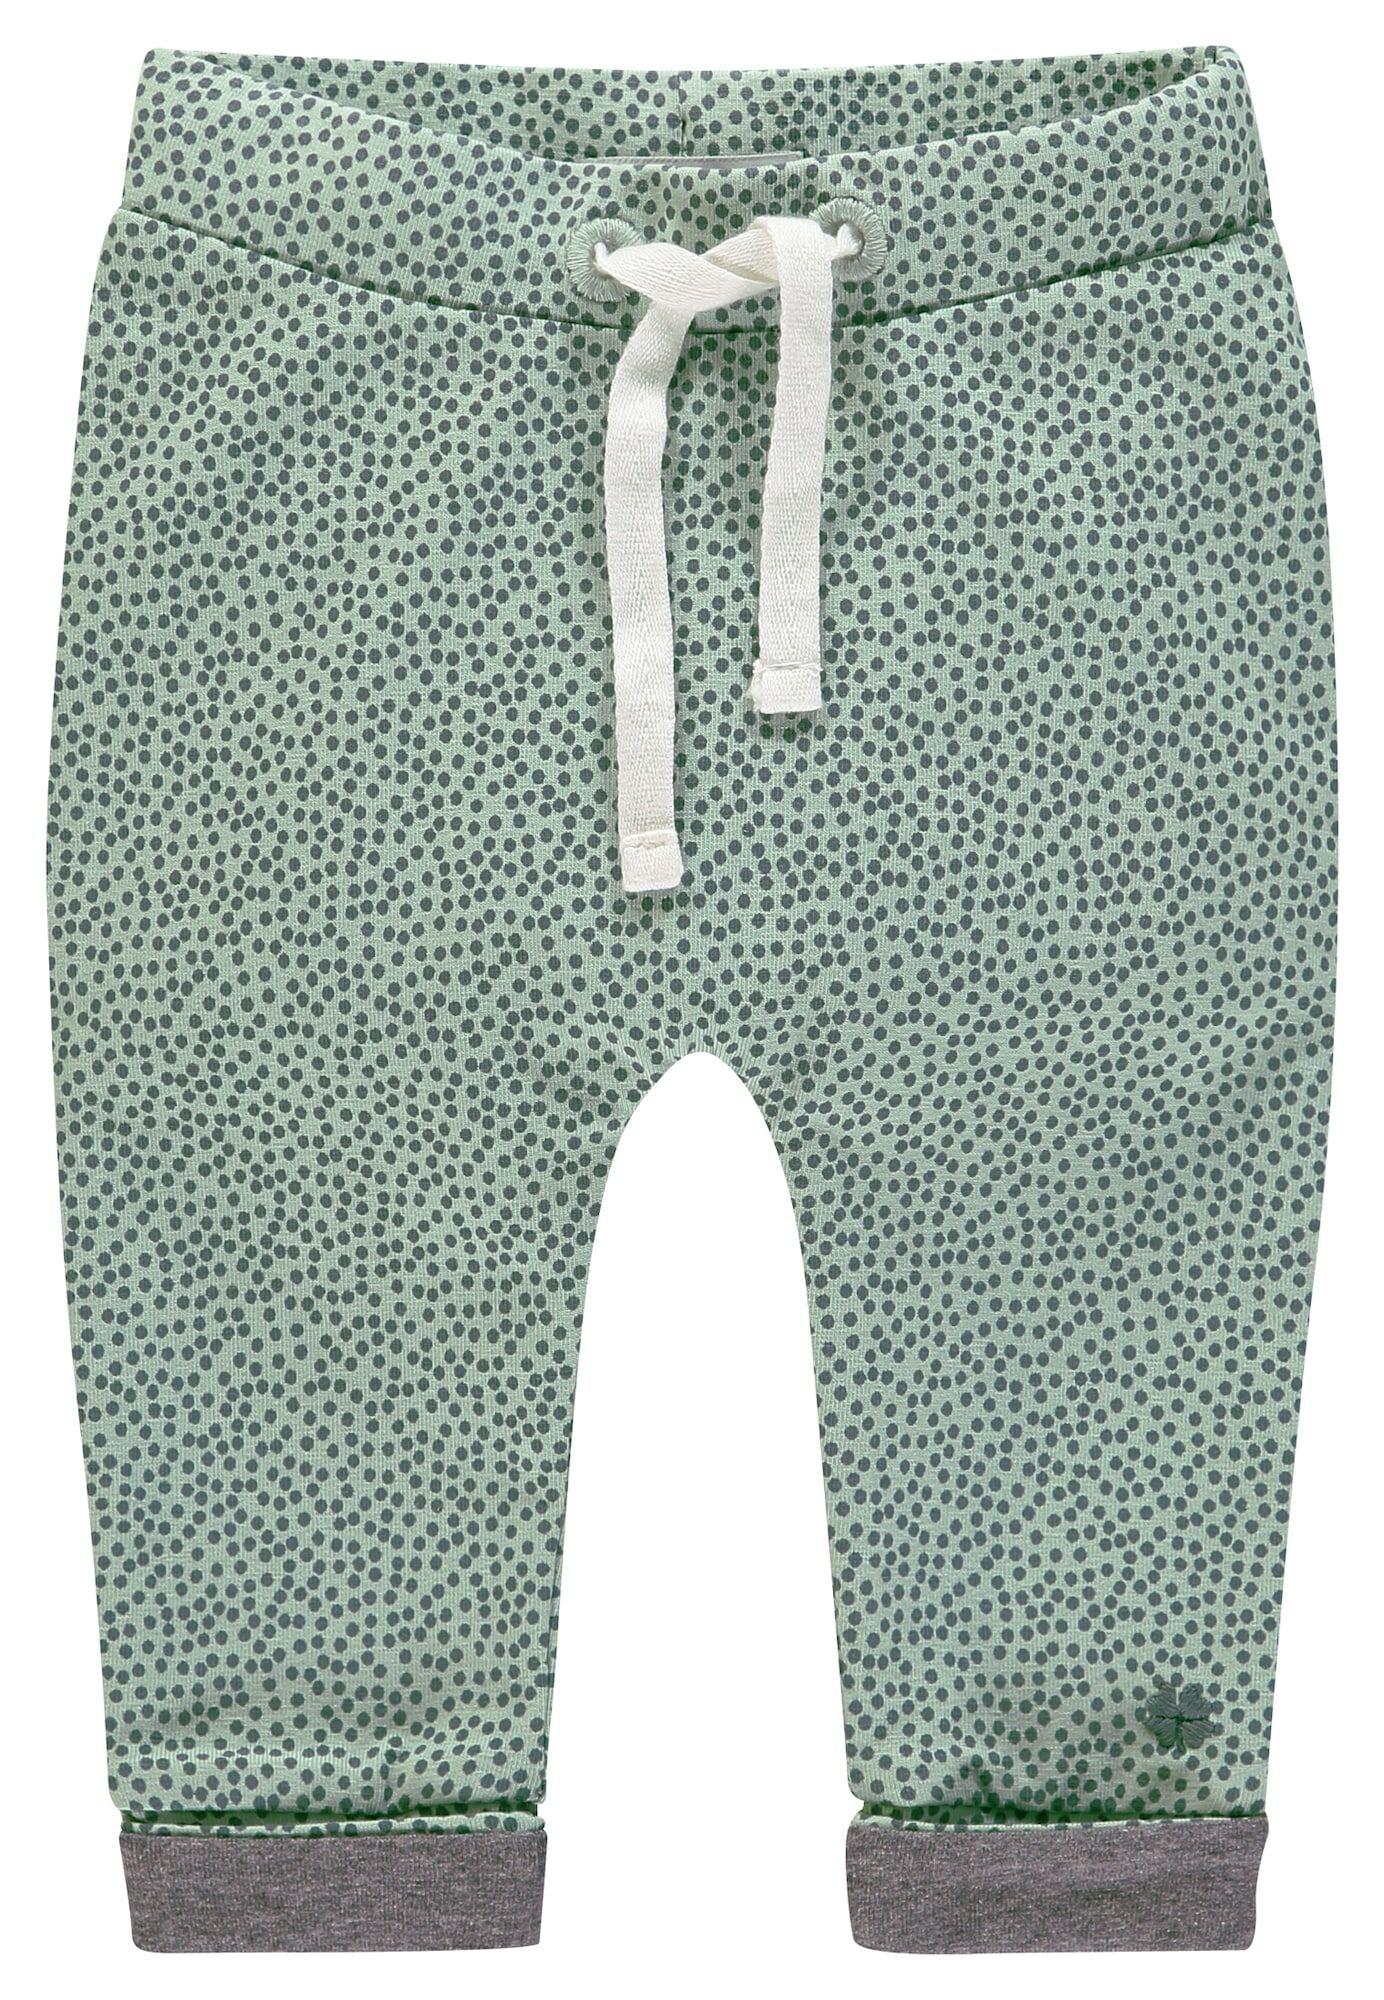 Noppies Pantalon 'Kirsten'  - Vert - Taille: 74 - kids